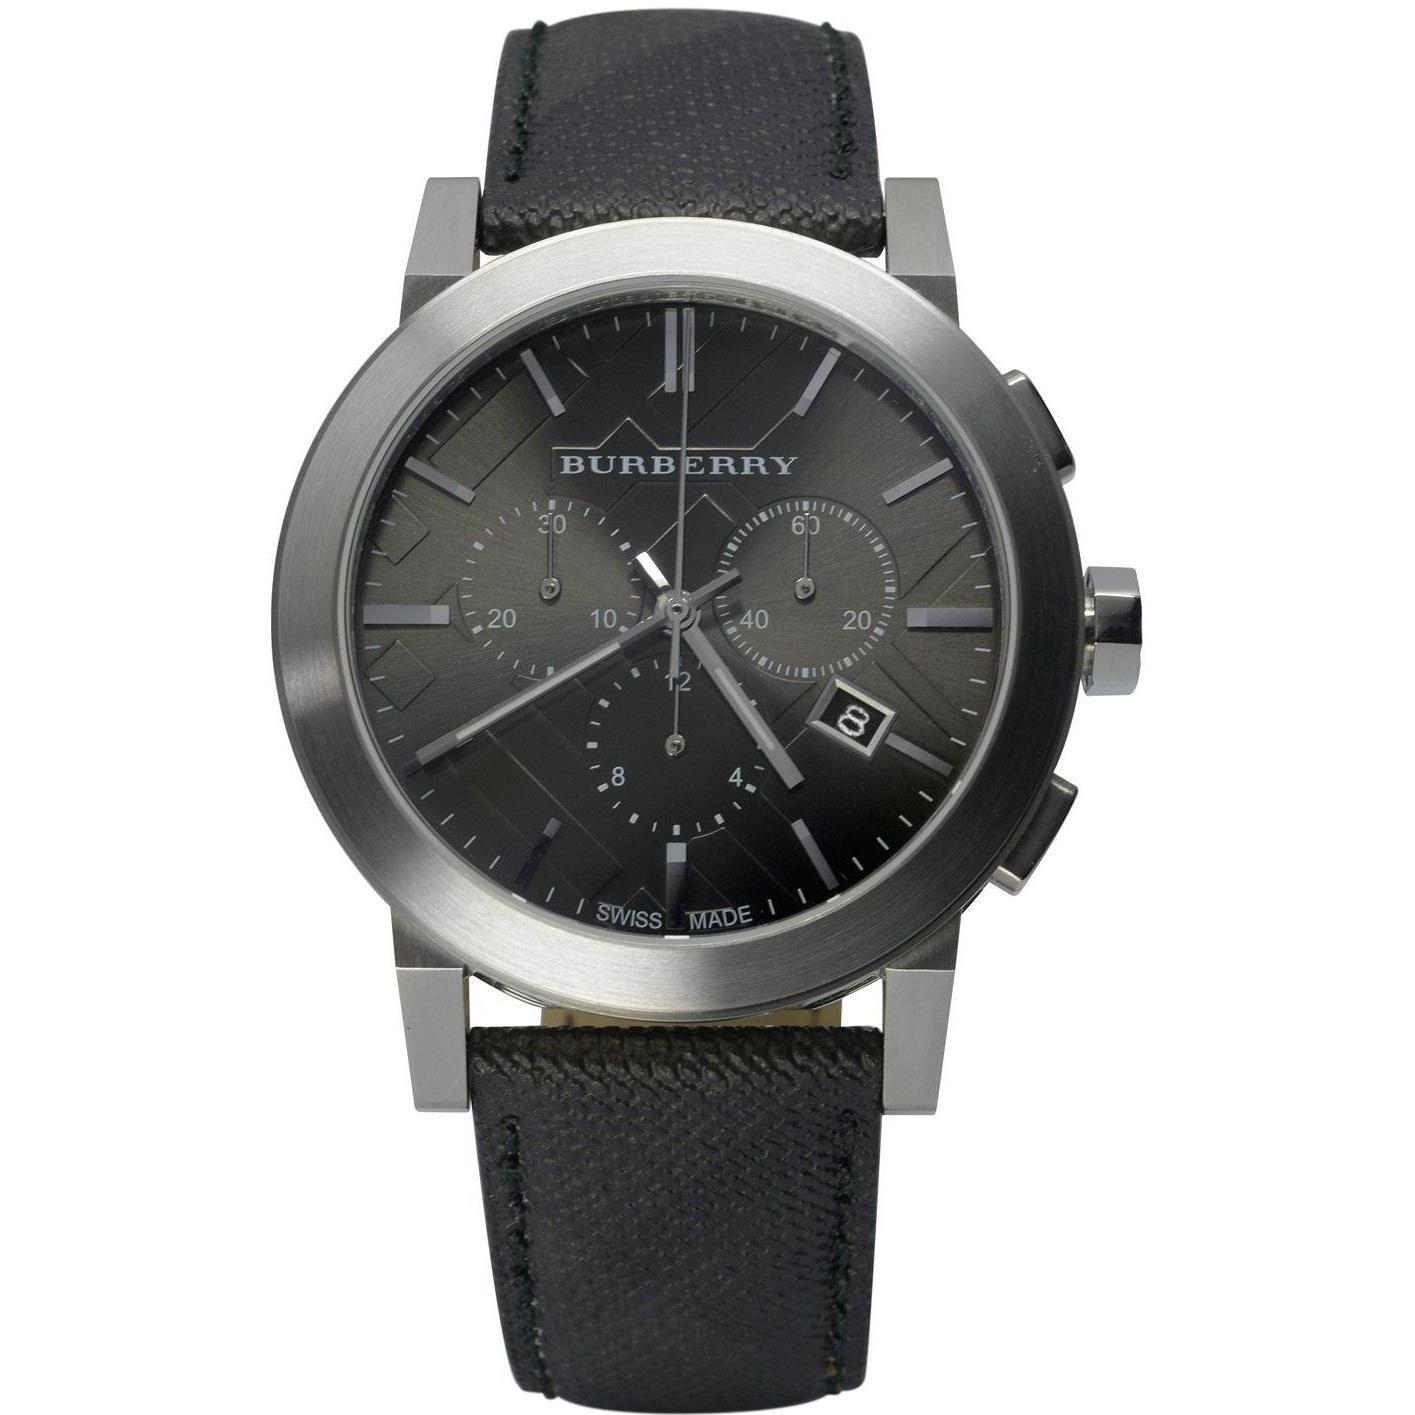 abc209674fc3 Amazon.com: Burberry Black Dial Black Fabric Strap Mens Watch BU9362:  Watches